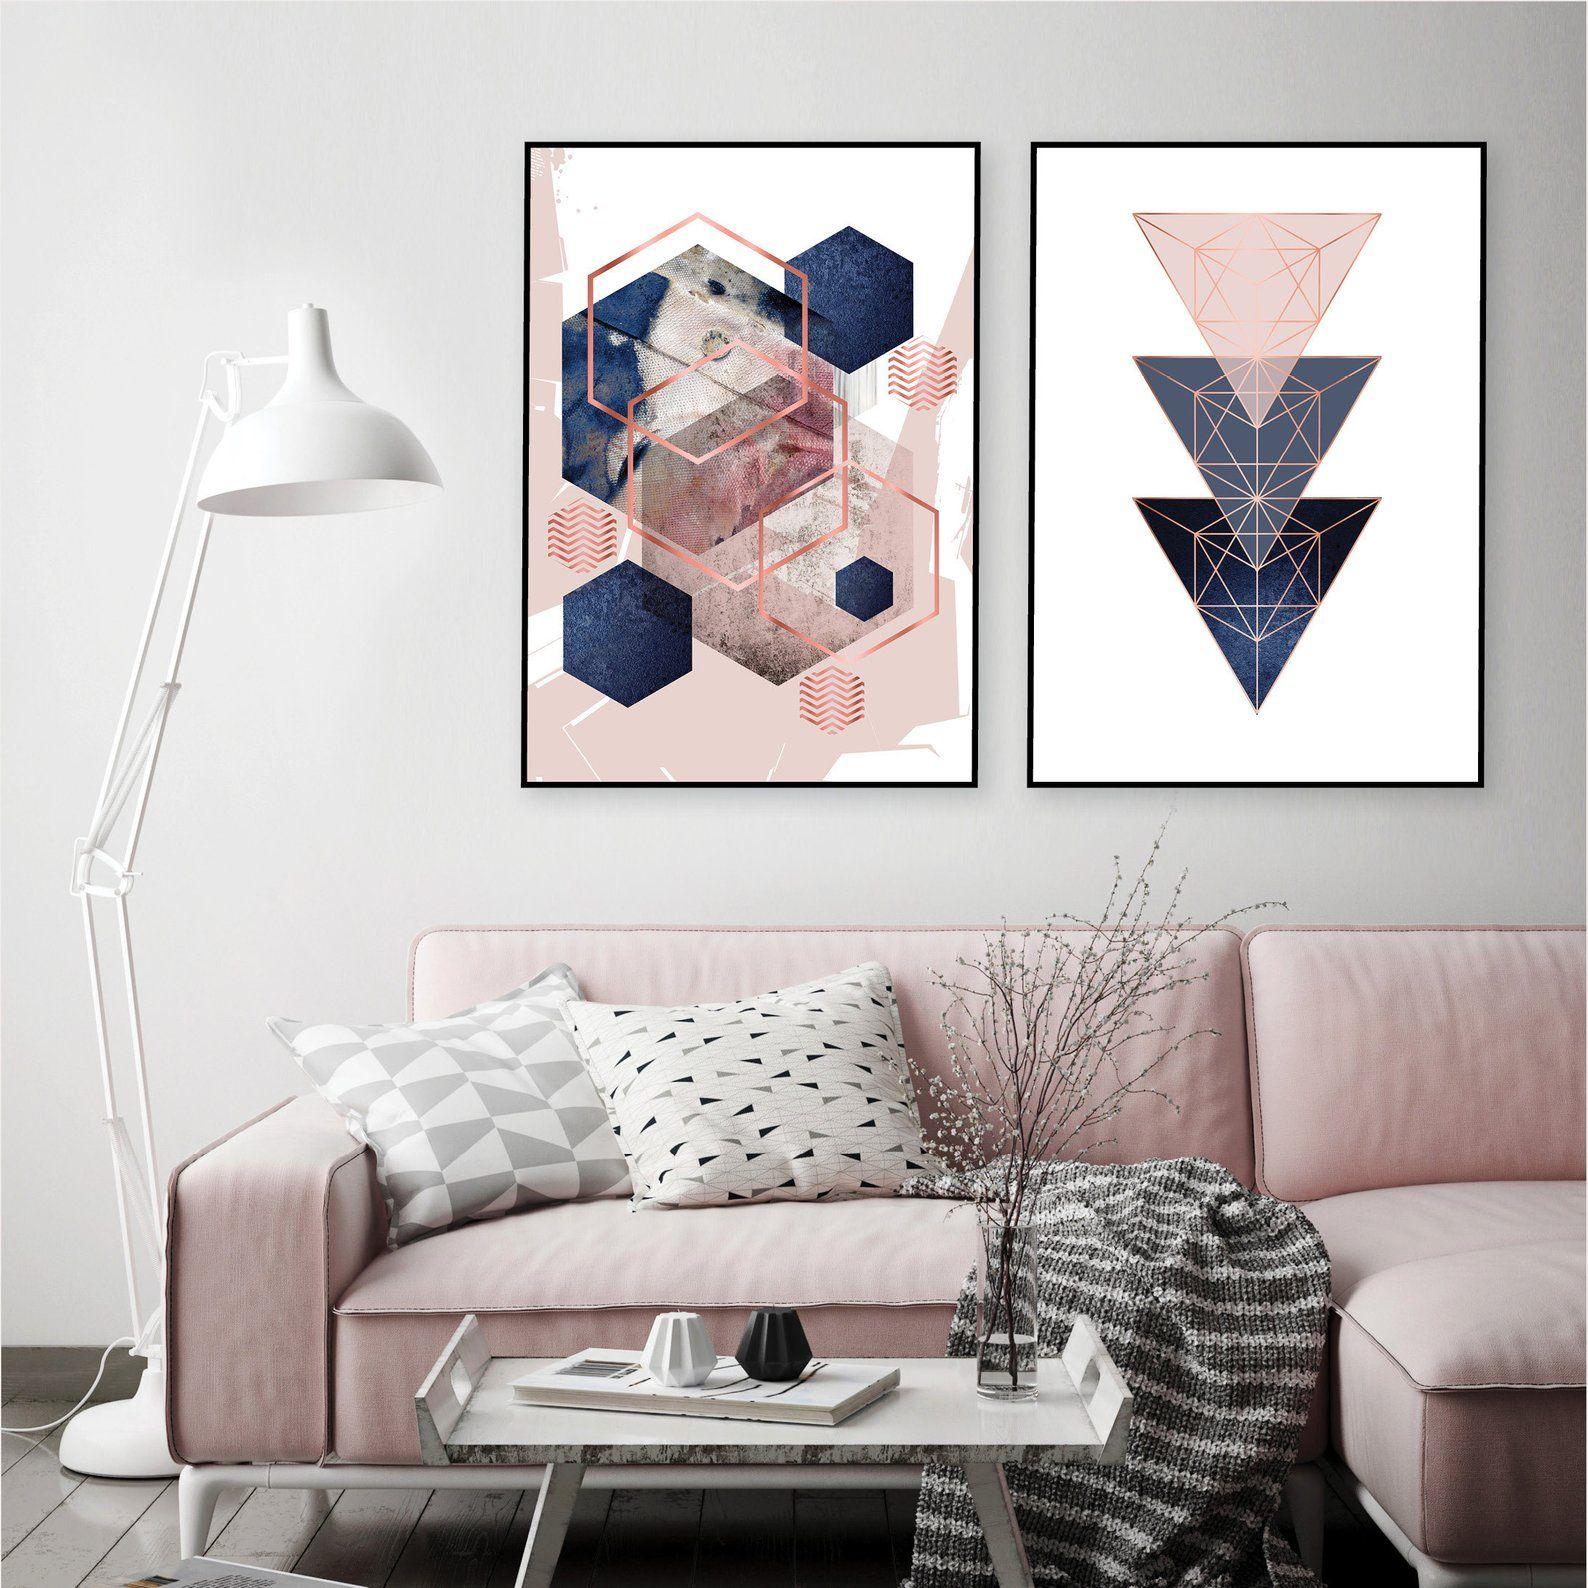 Set Of 2 Printable Blush Pink Navy Blue Rose Gold Geometric Art Prints Digital Download Dusky Pink Indigo Bedroom Wall Decor Trending Now Wall Decor Bedroom Wall Decor Trends Trending Decor